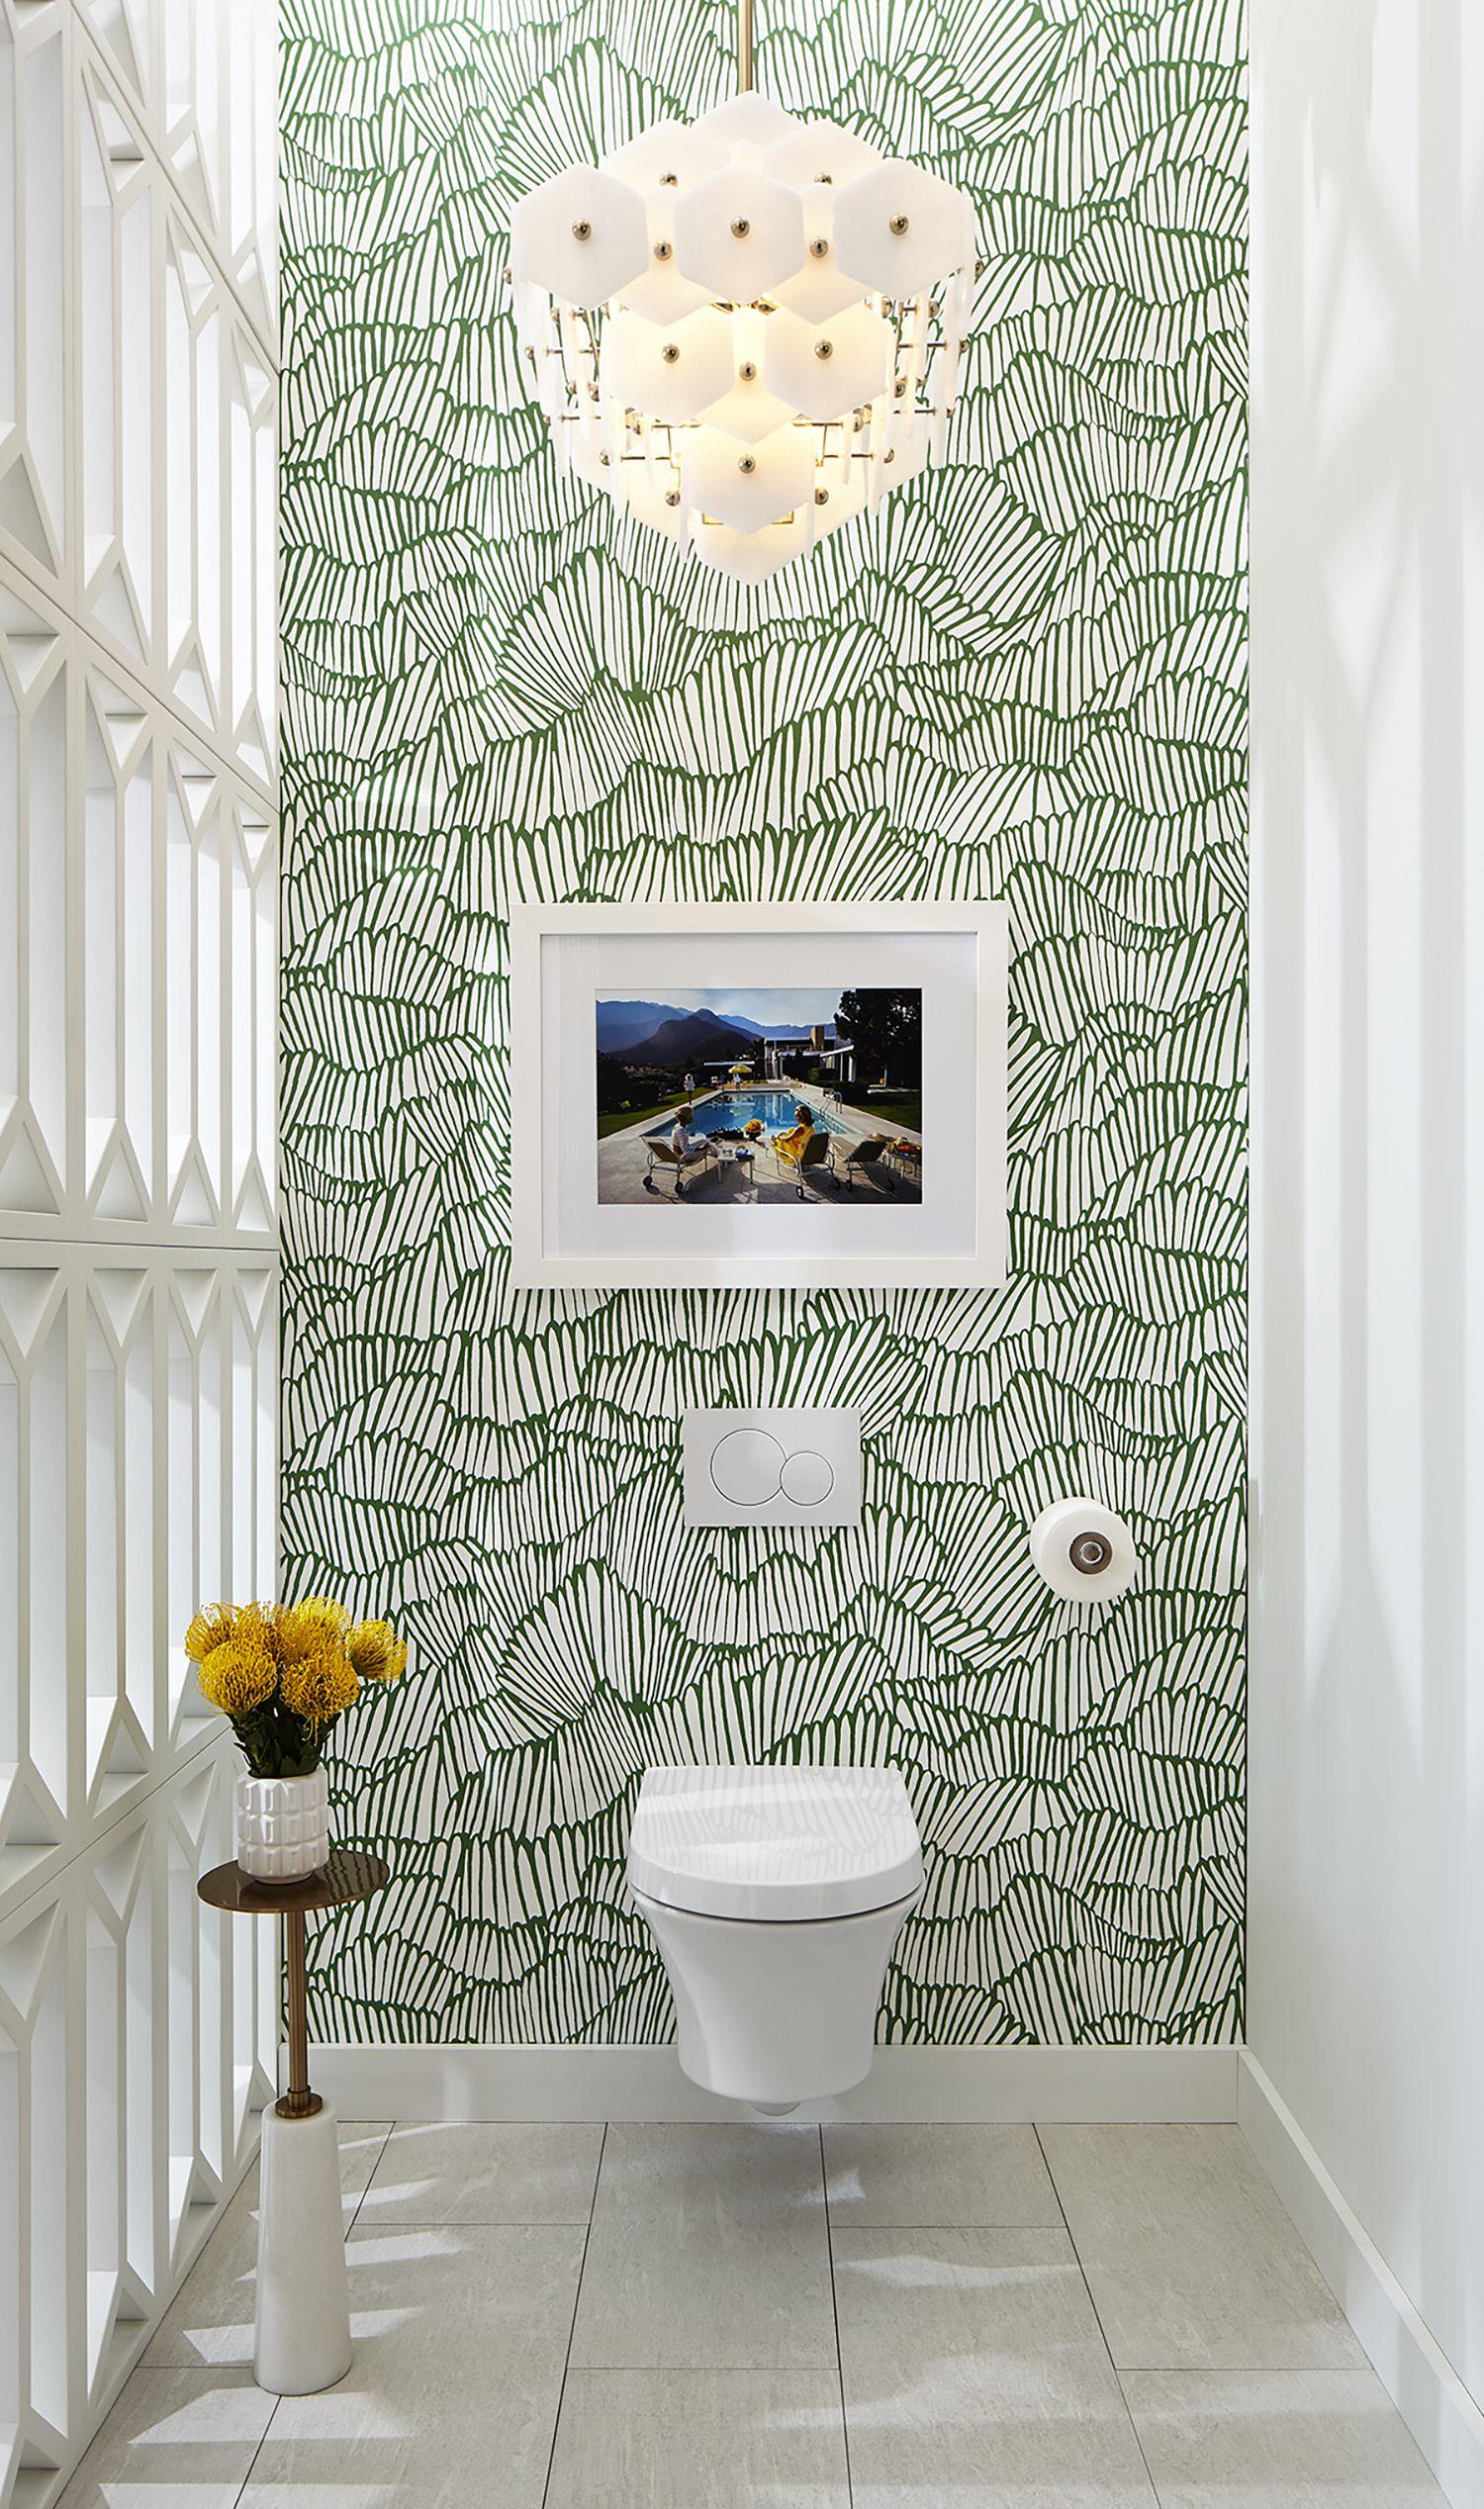 Bathroom Wallpaper Home Depot